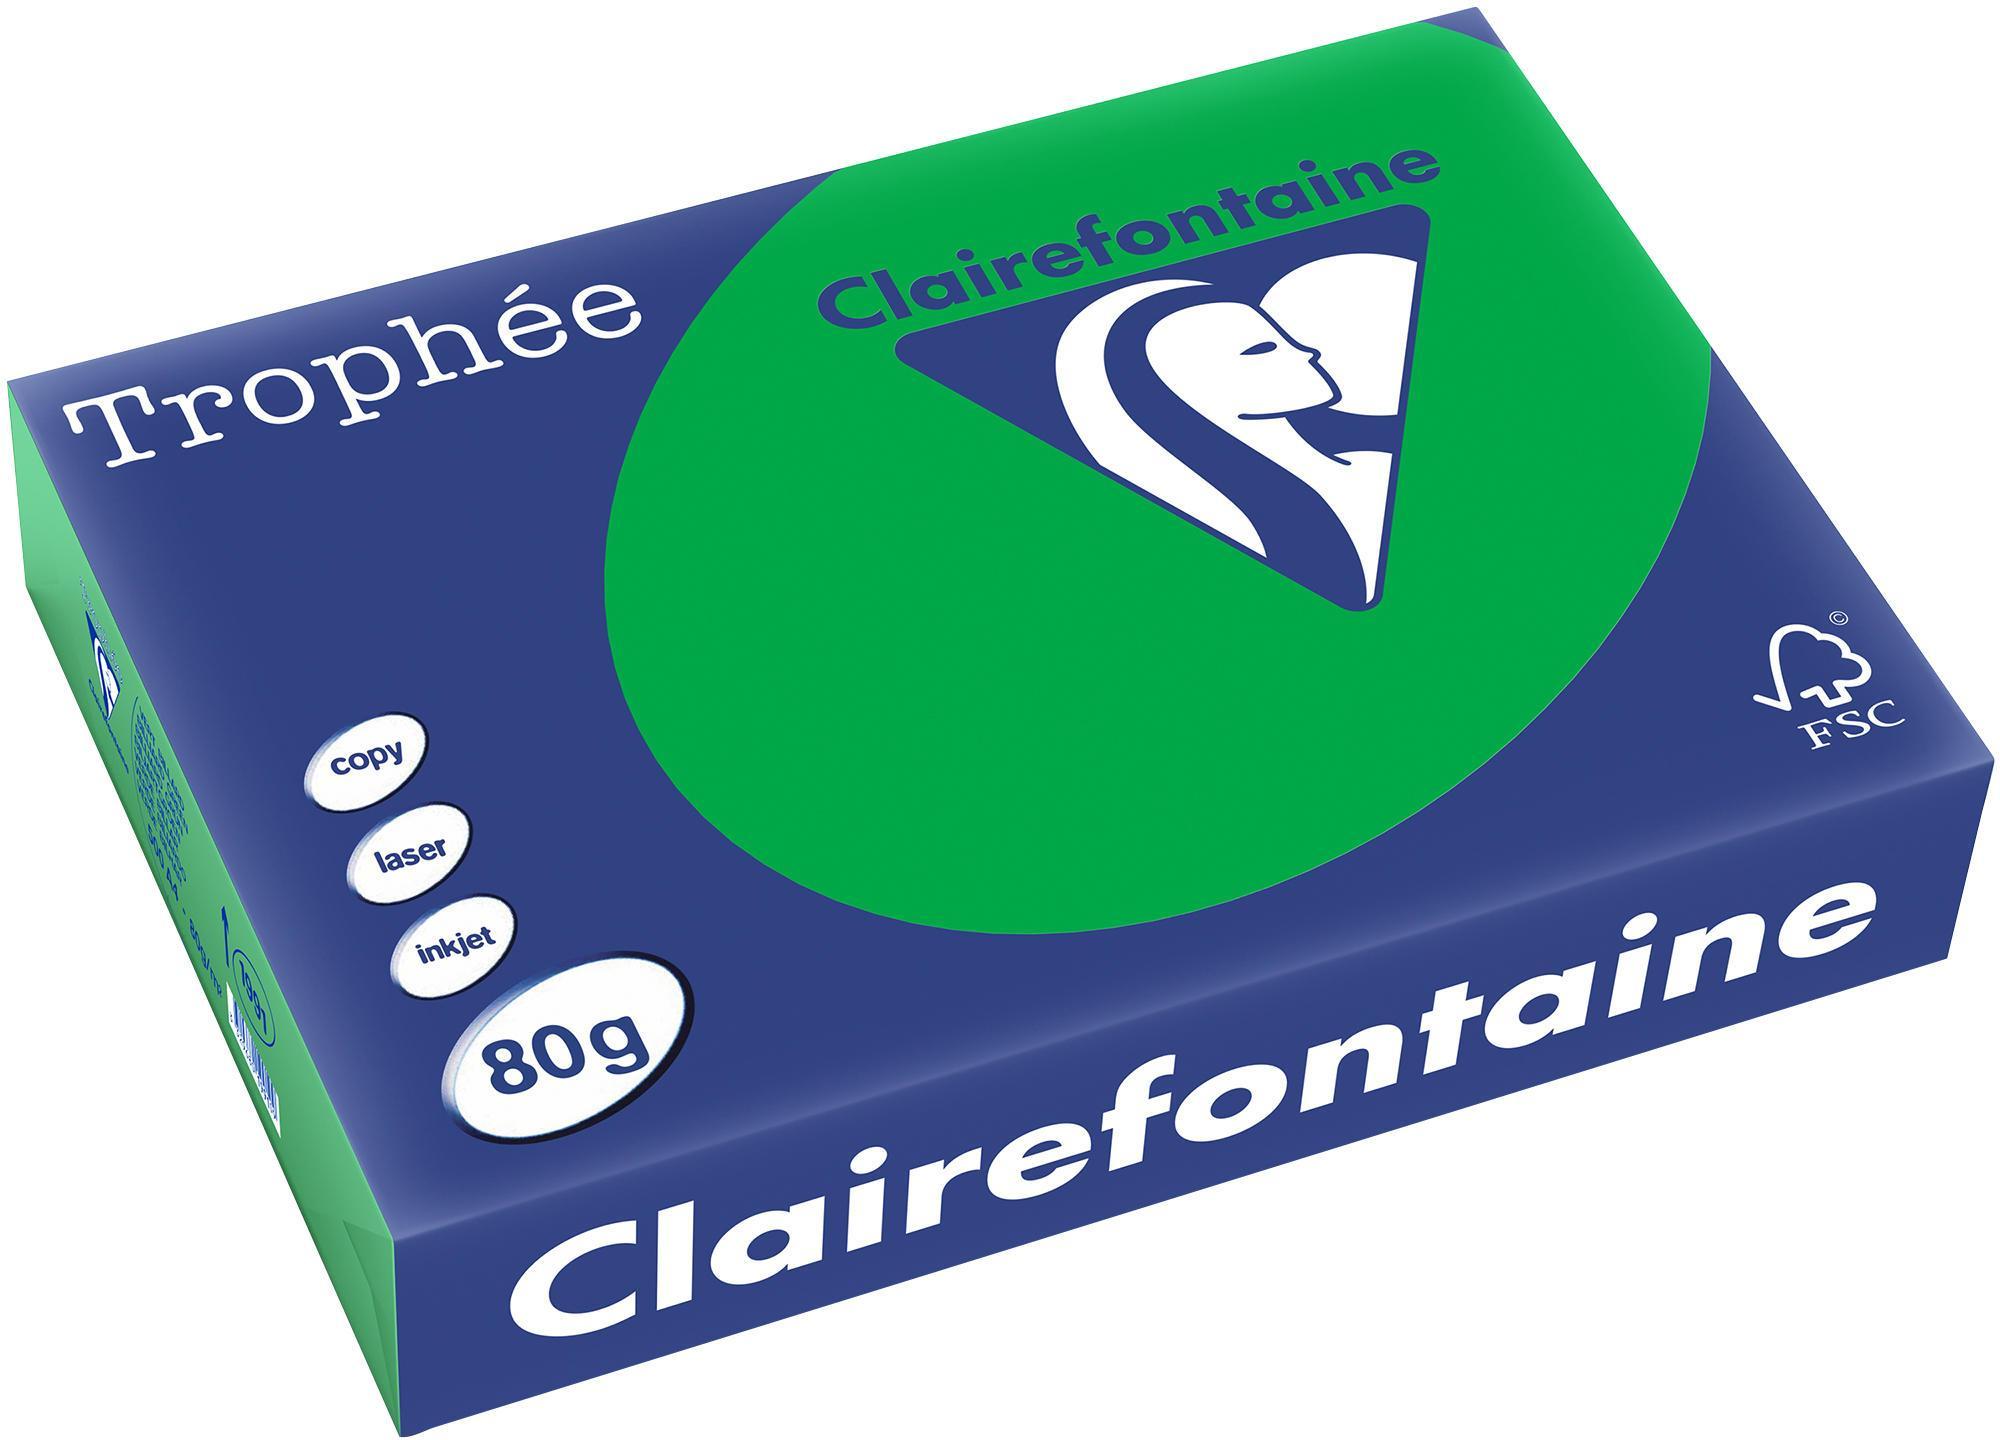 Clairefontaine A4 papier gekleurd Biljartgroen